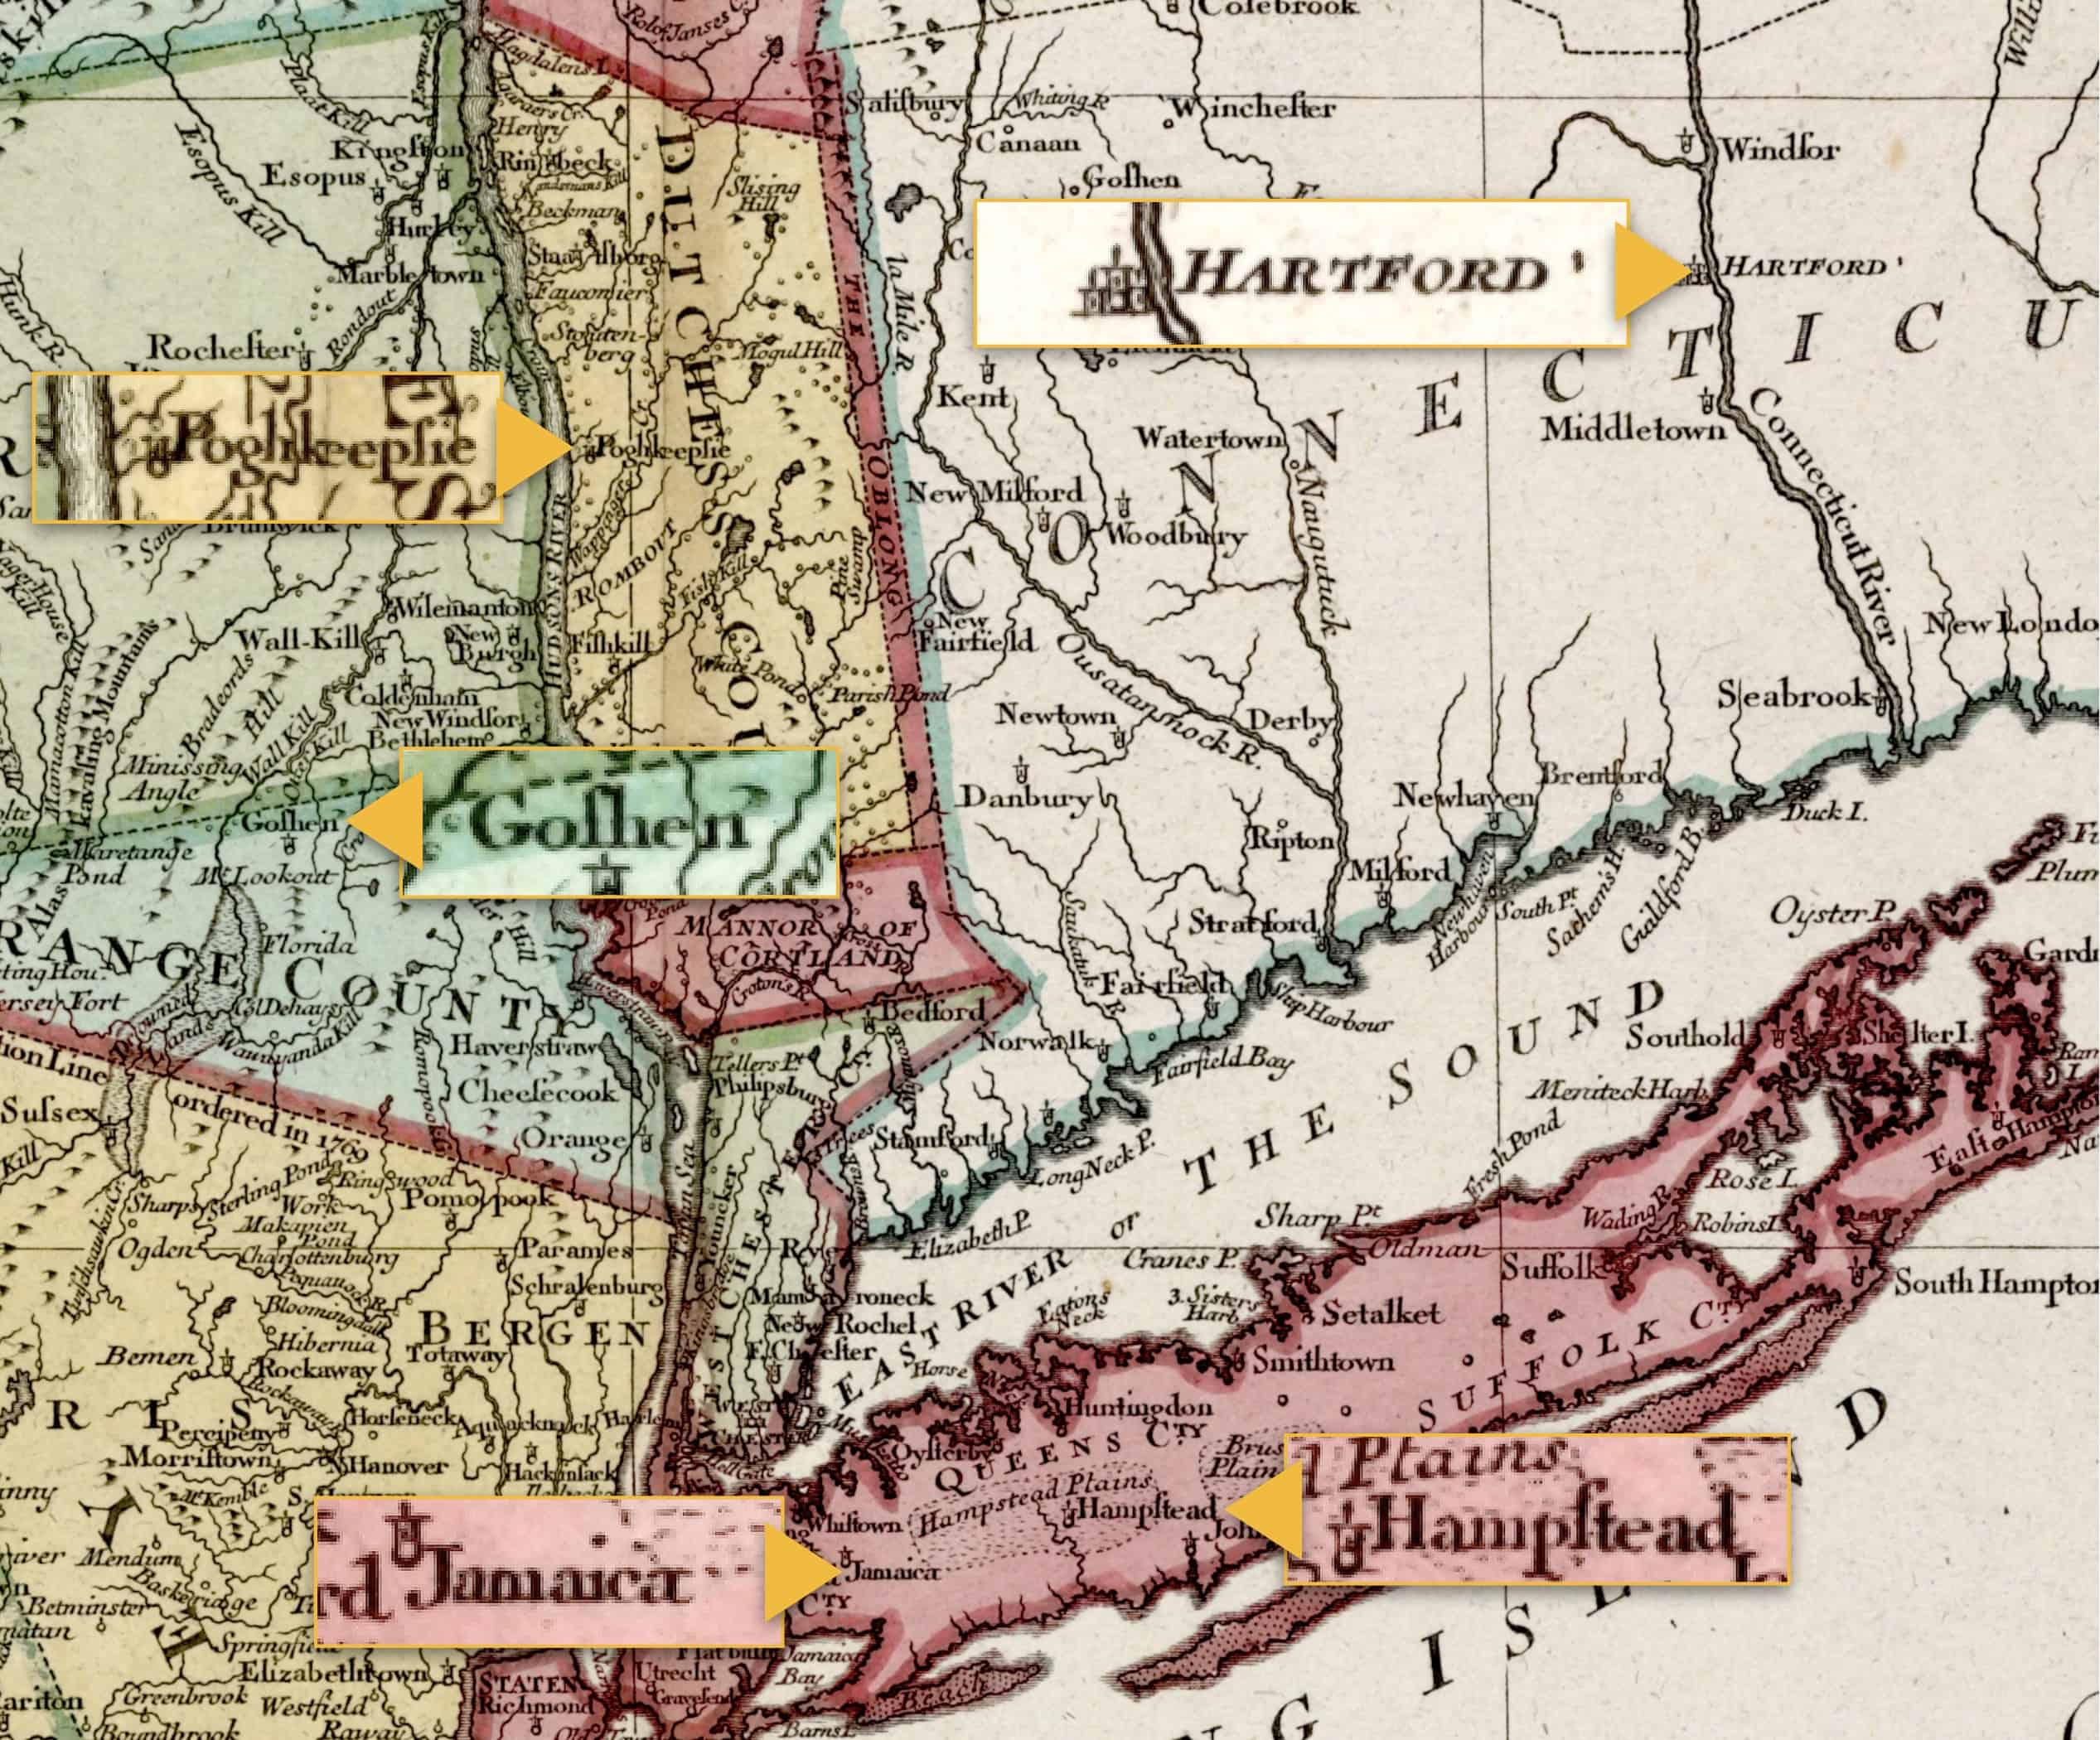 Clowes Hart Genealogy Map 1777